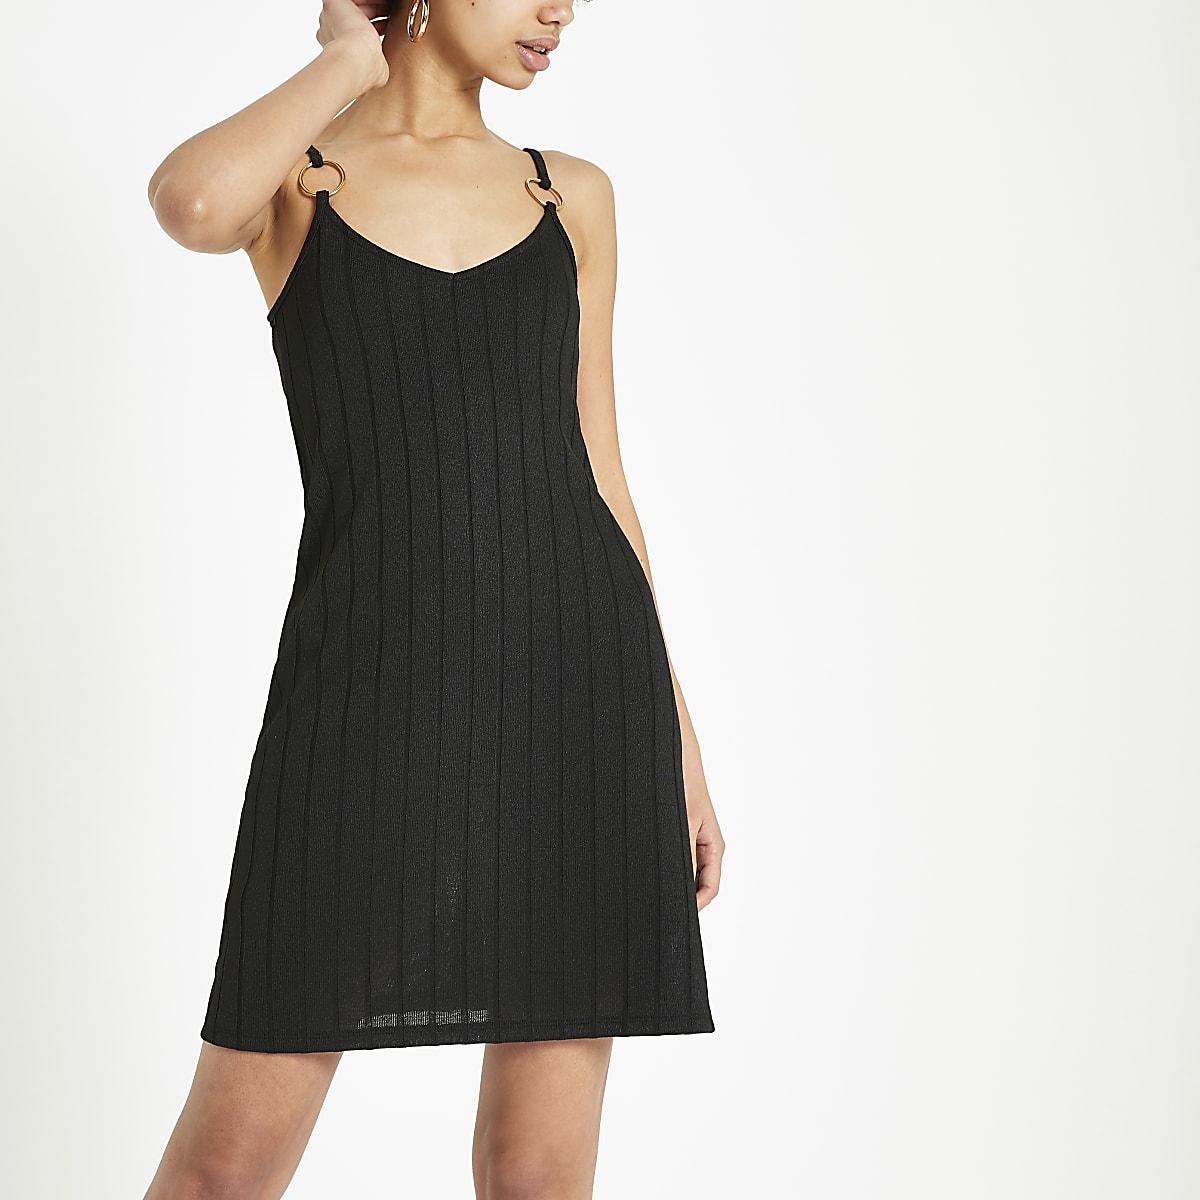 a5f16556 Black textured jersey swing dress - Swing Dresses - Dresses - women